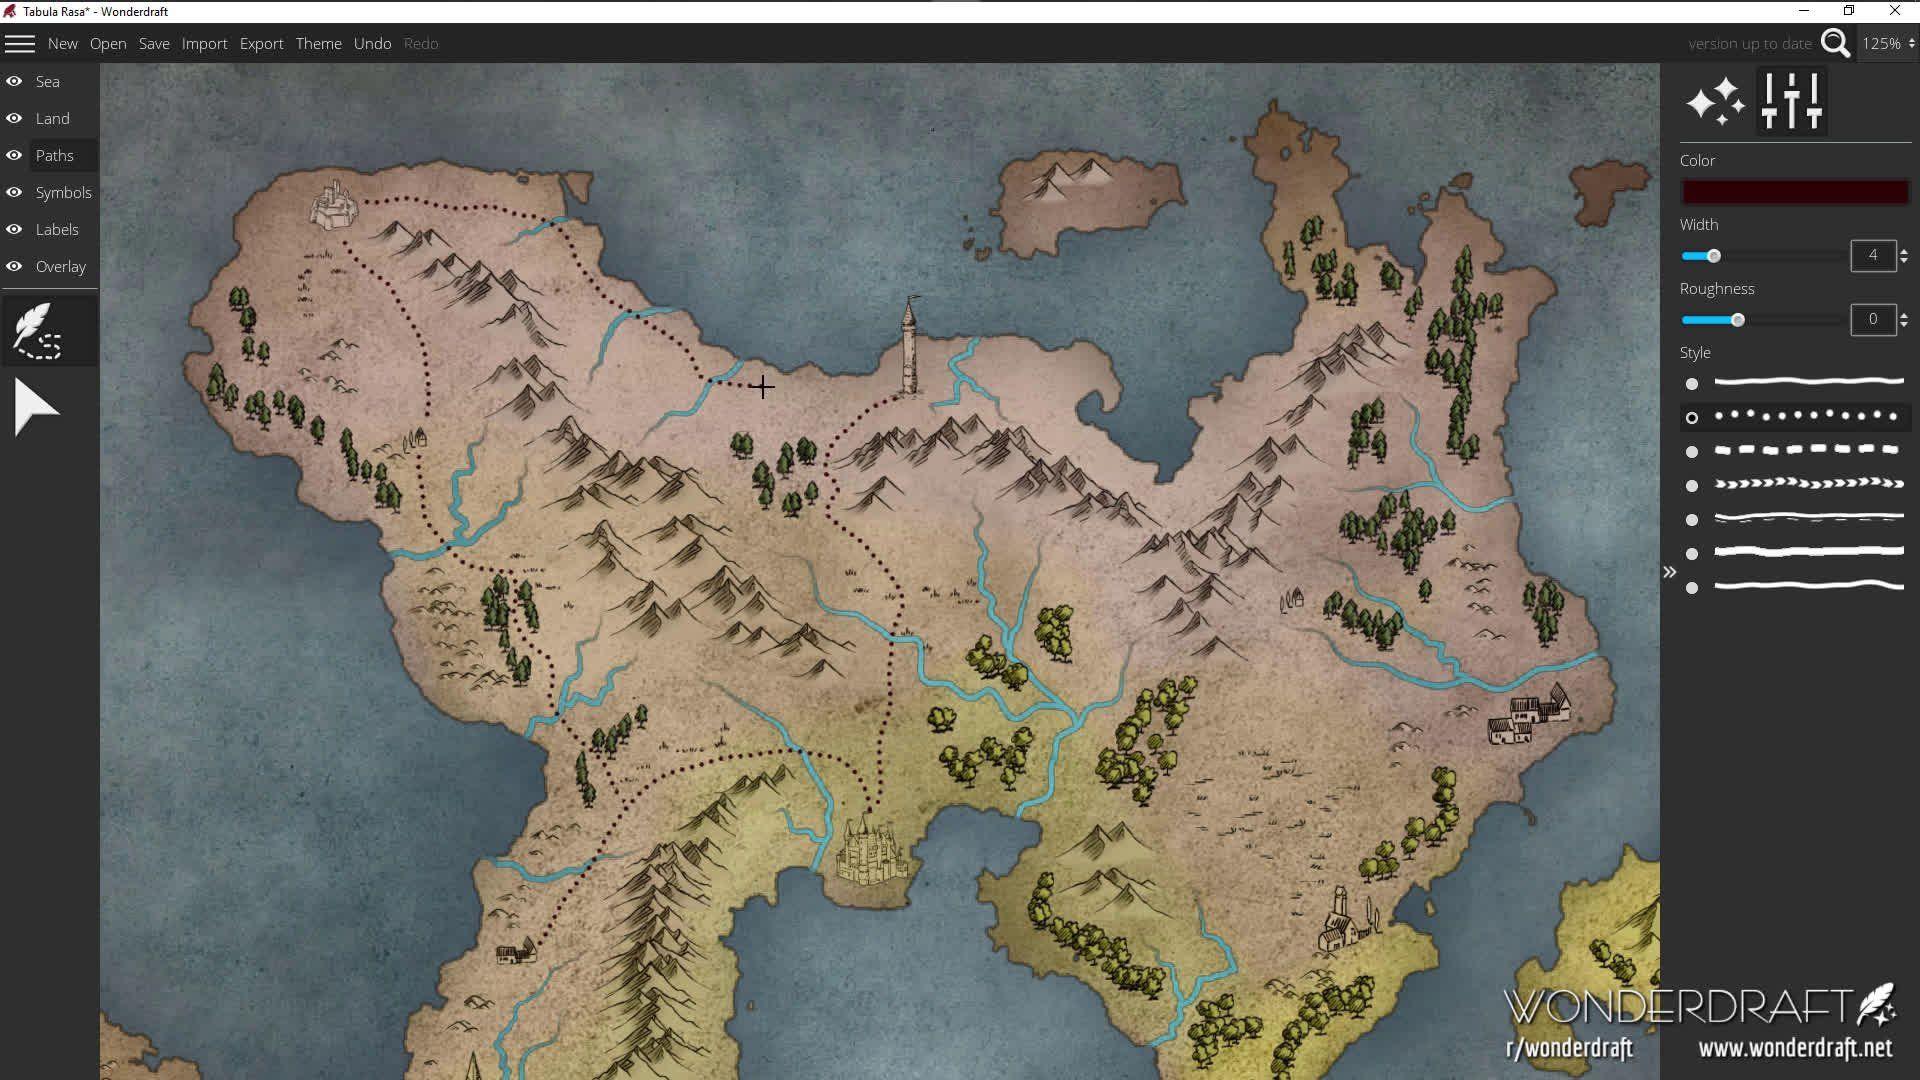 OC] I'm so happy to finally say that Wonderdraft, my new map